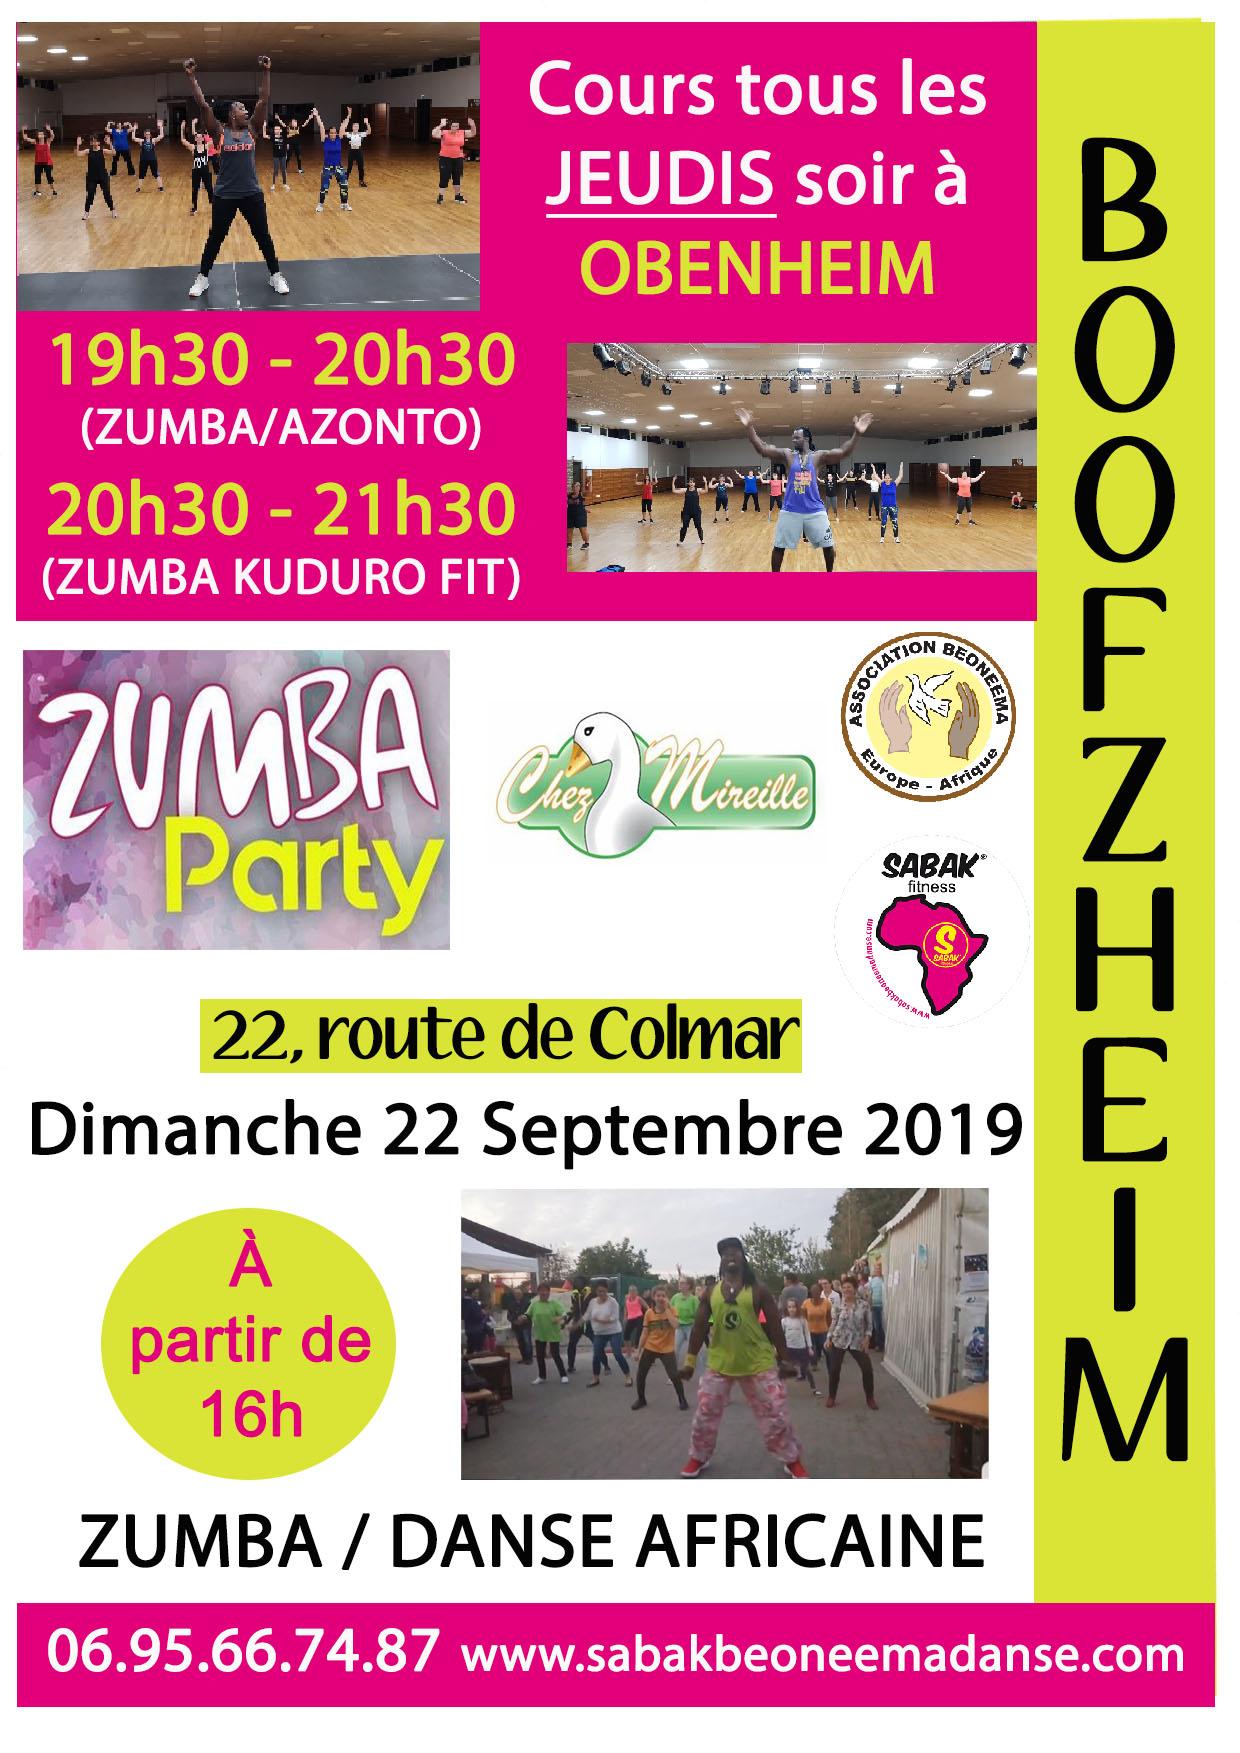 ZUMBA PARTY ET DANSE AFRICAINE À BOOFZHEIM CHEZ MIREILLE